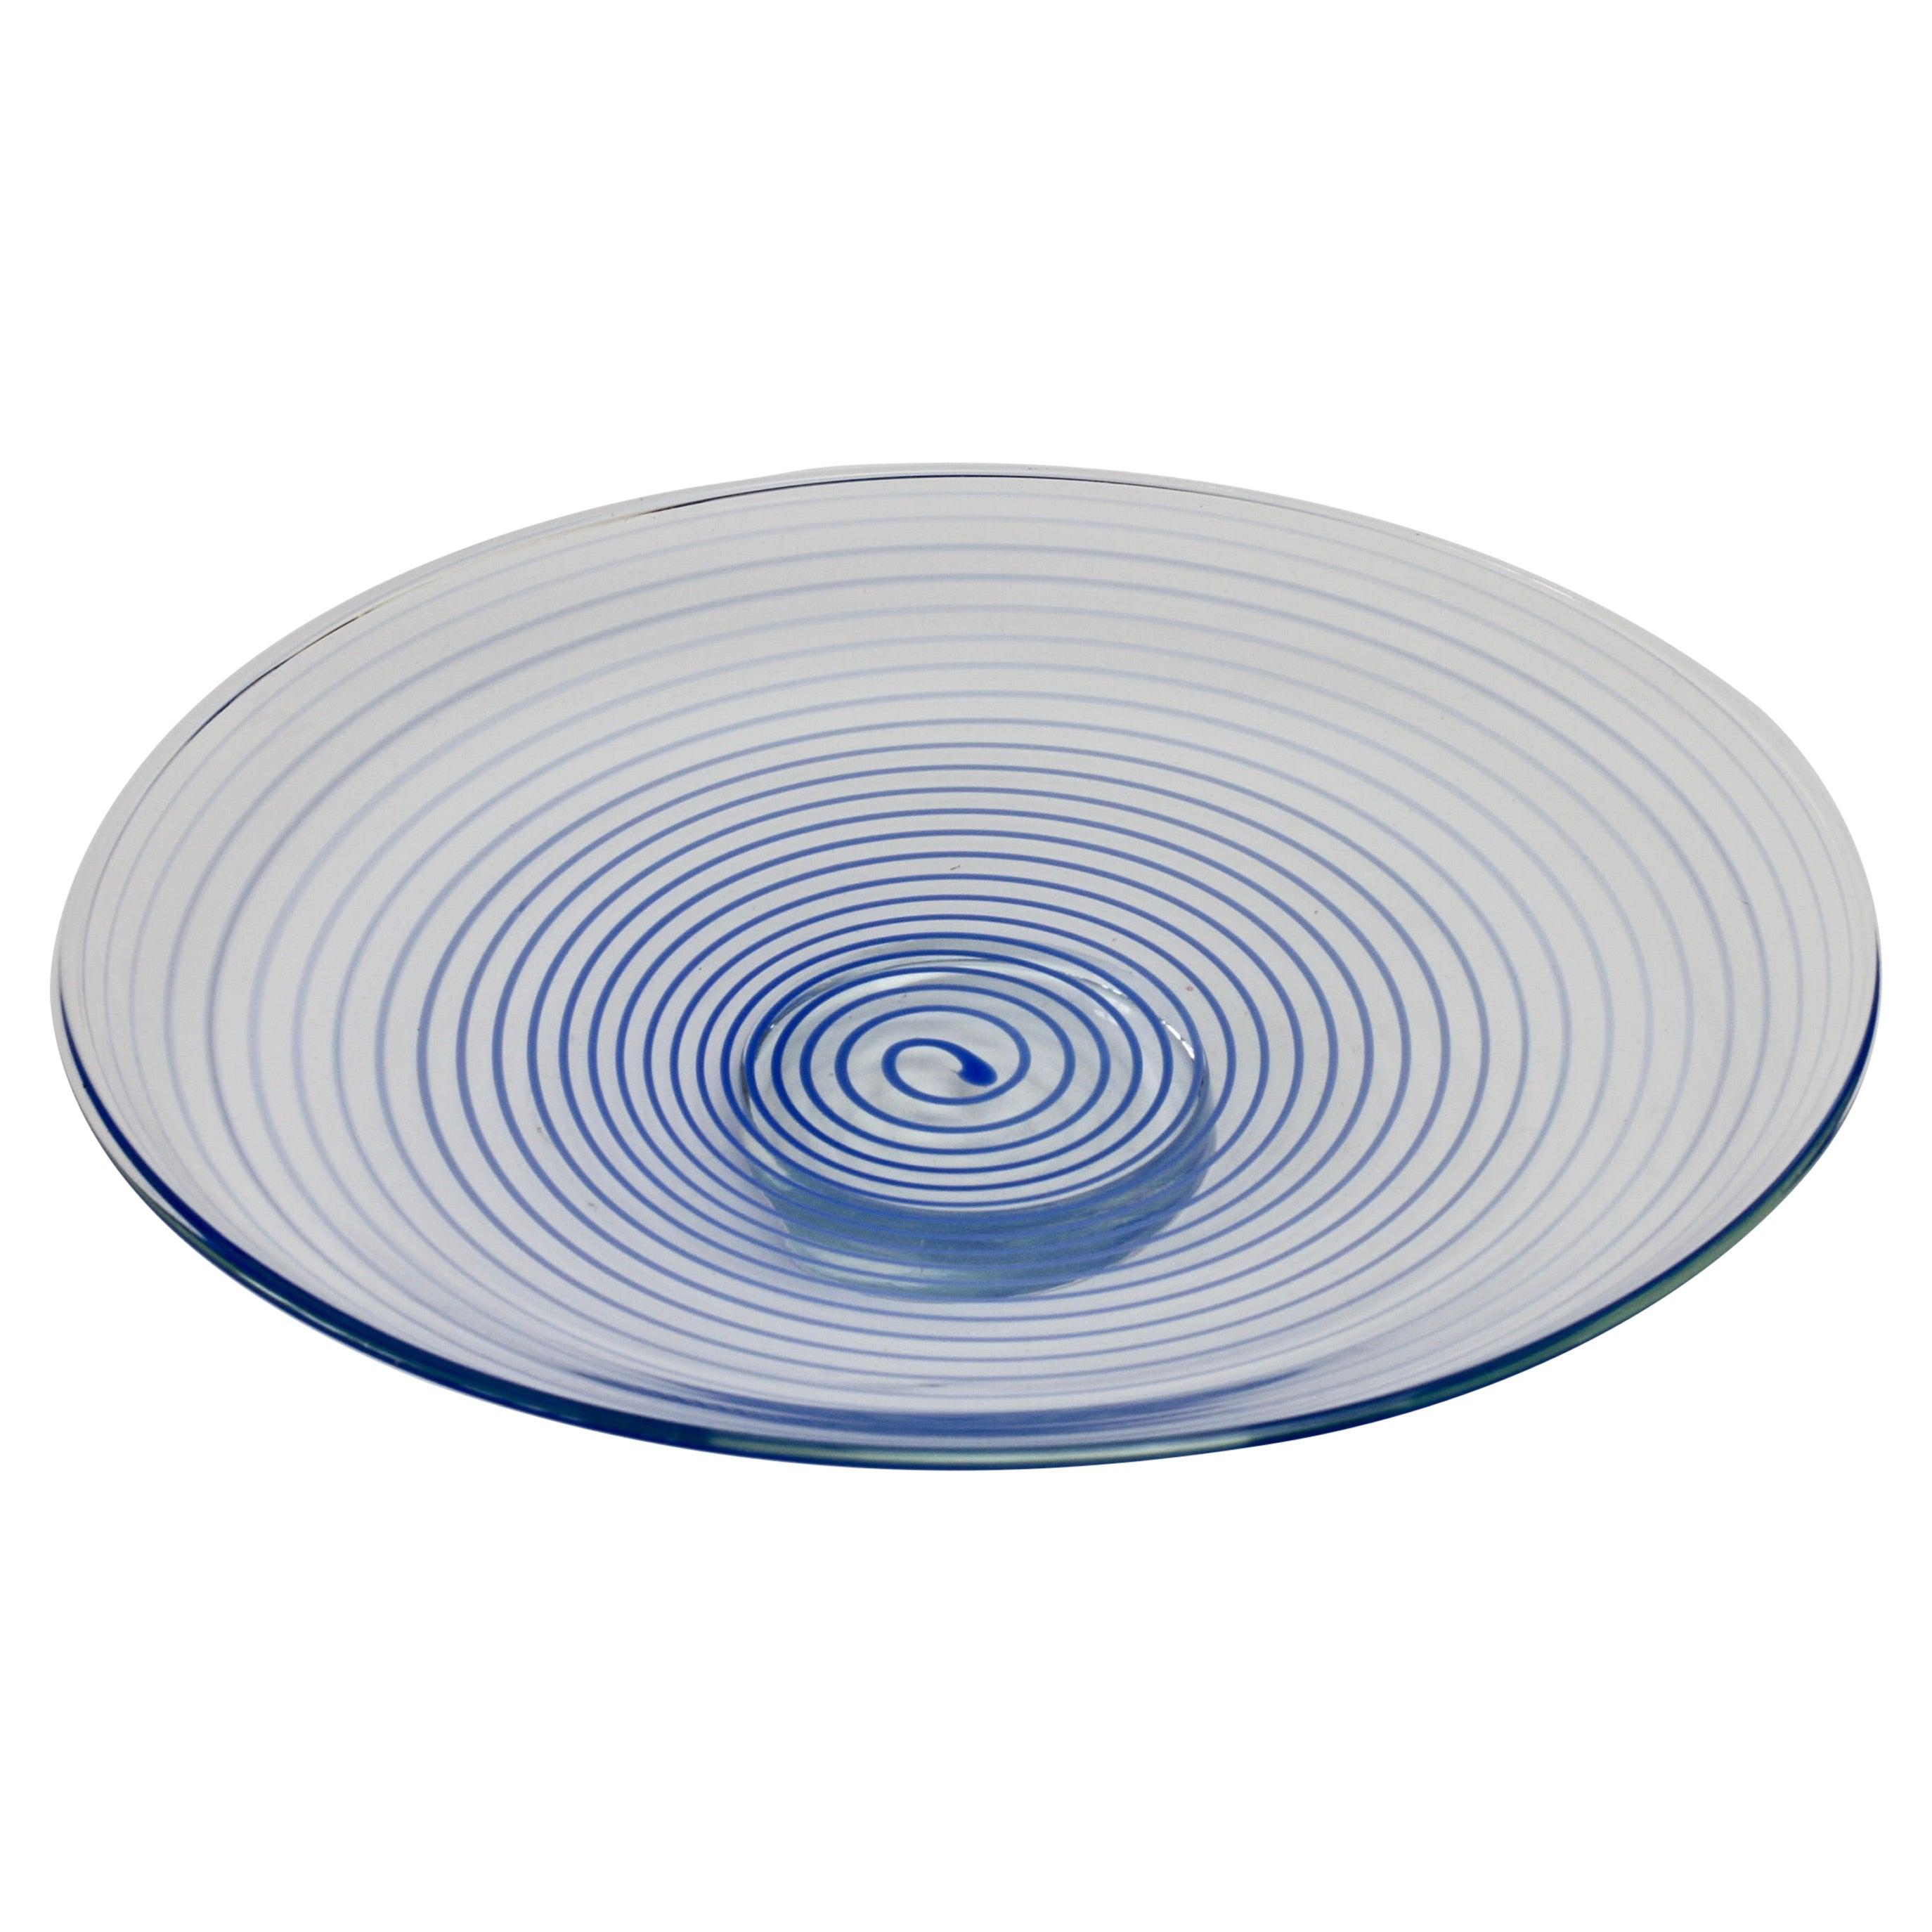 Large Cenedese Venetian Italian Murano Glass Blue Spirali Bowl or Serving Dish